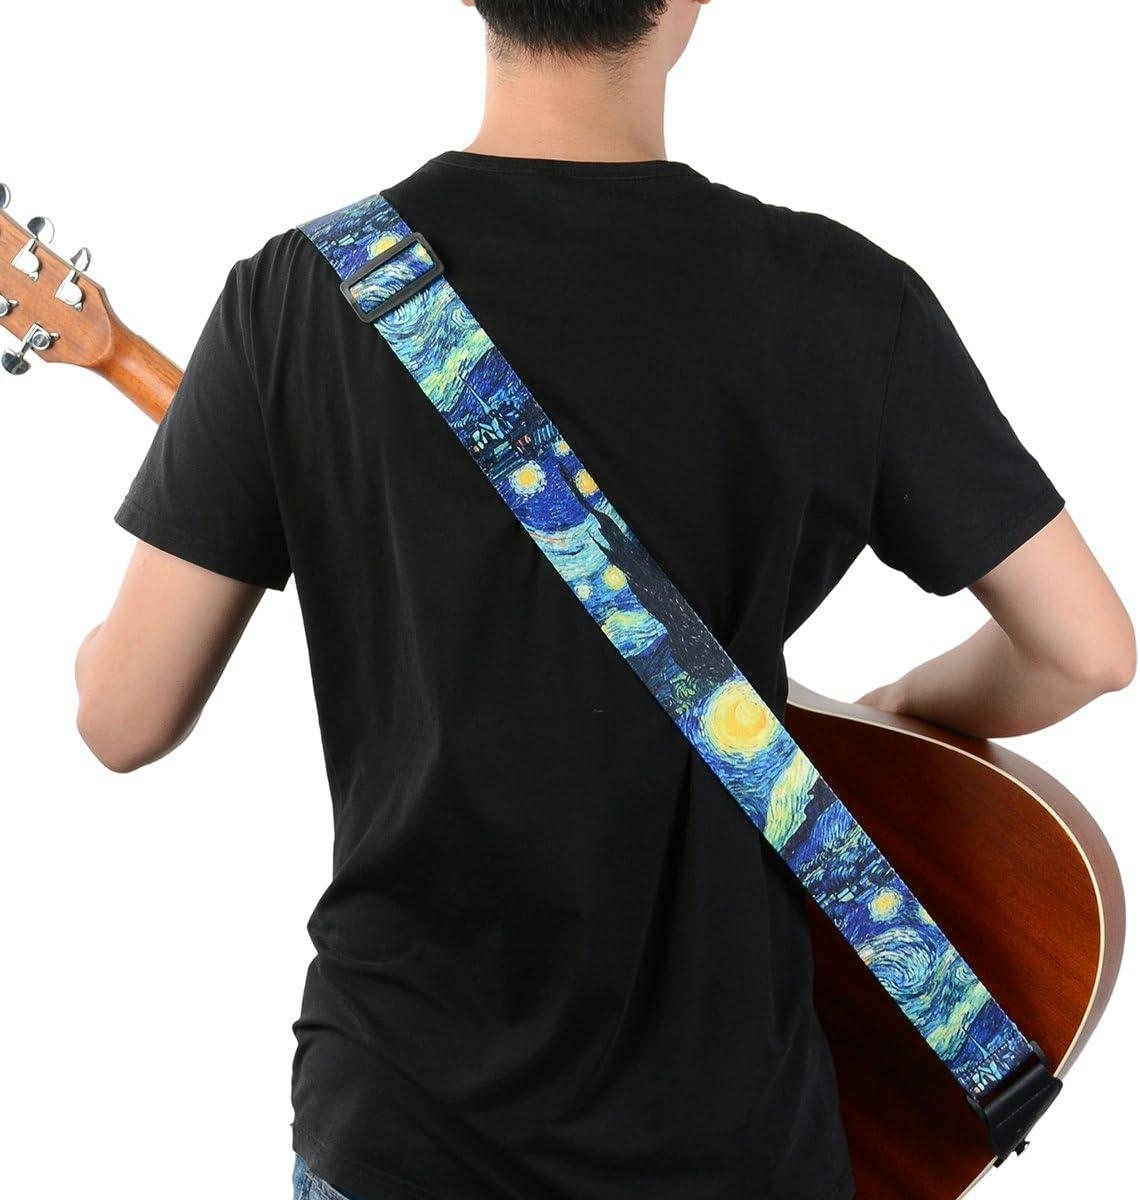 Electric Guitar Bass Includes Strap Button /& 2 Strap Locks BestSounds Guitar Strap /& Leather ends Guitar Shoulder Strap Suitable for Acoustic Guitar